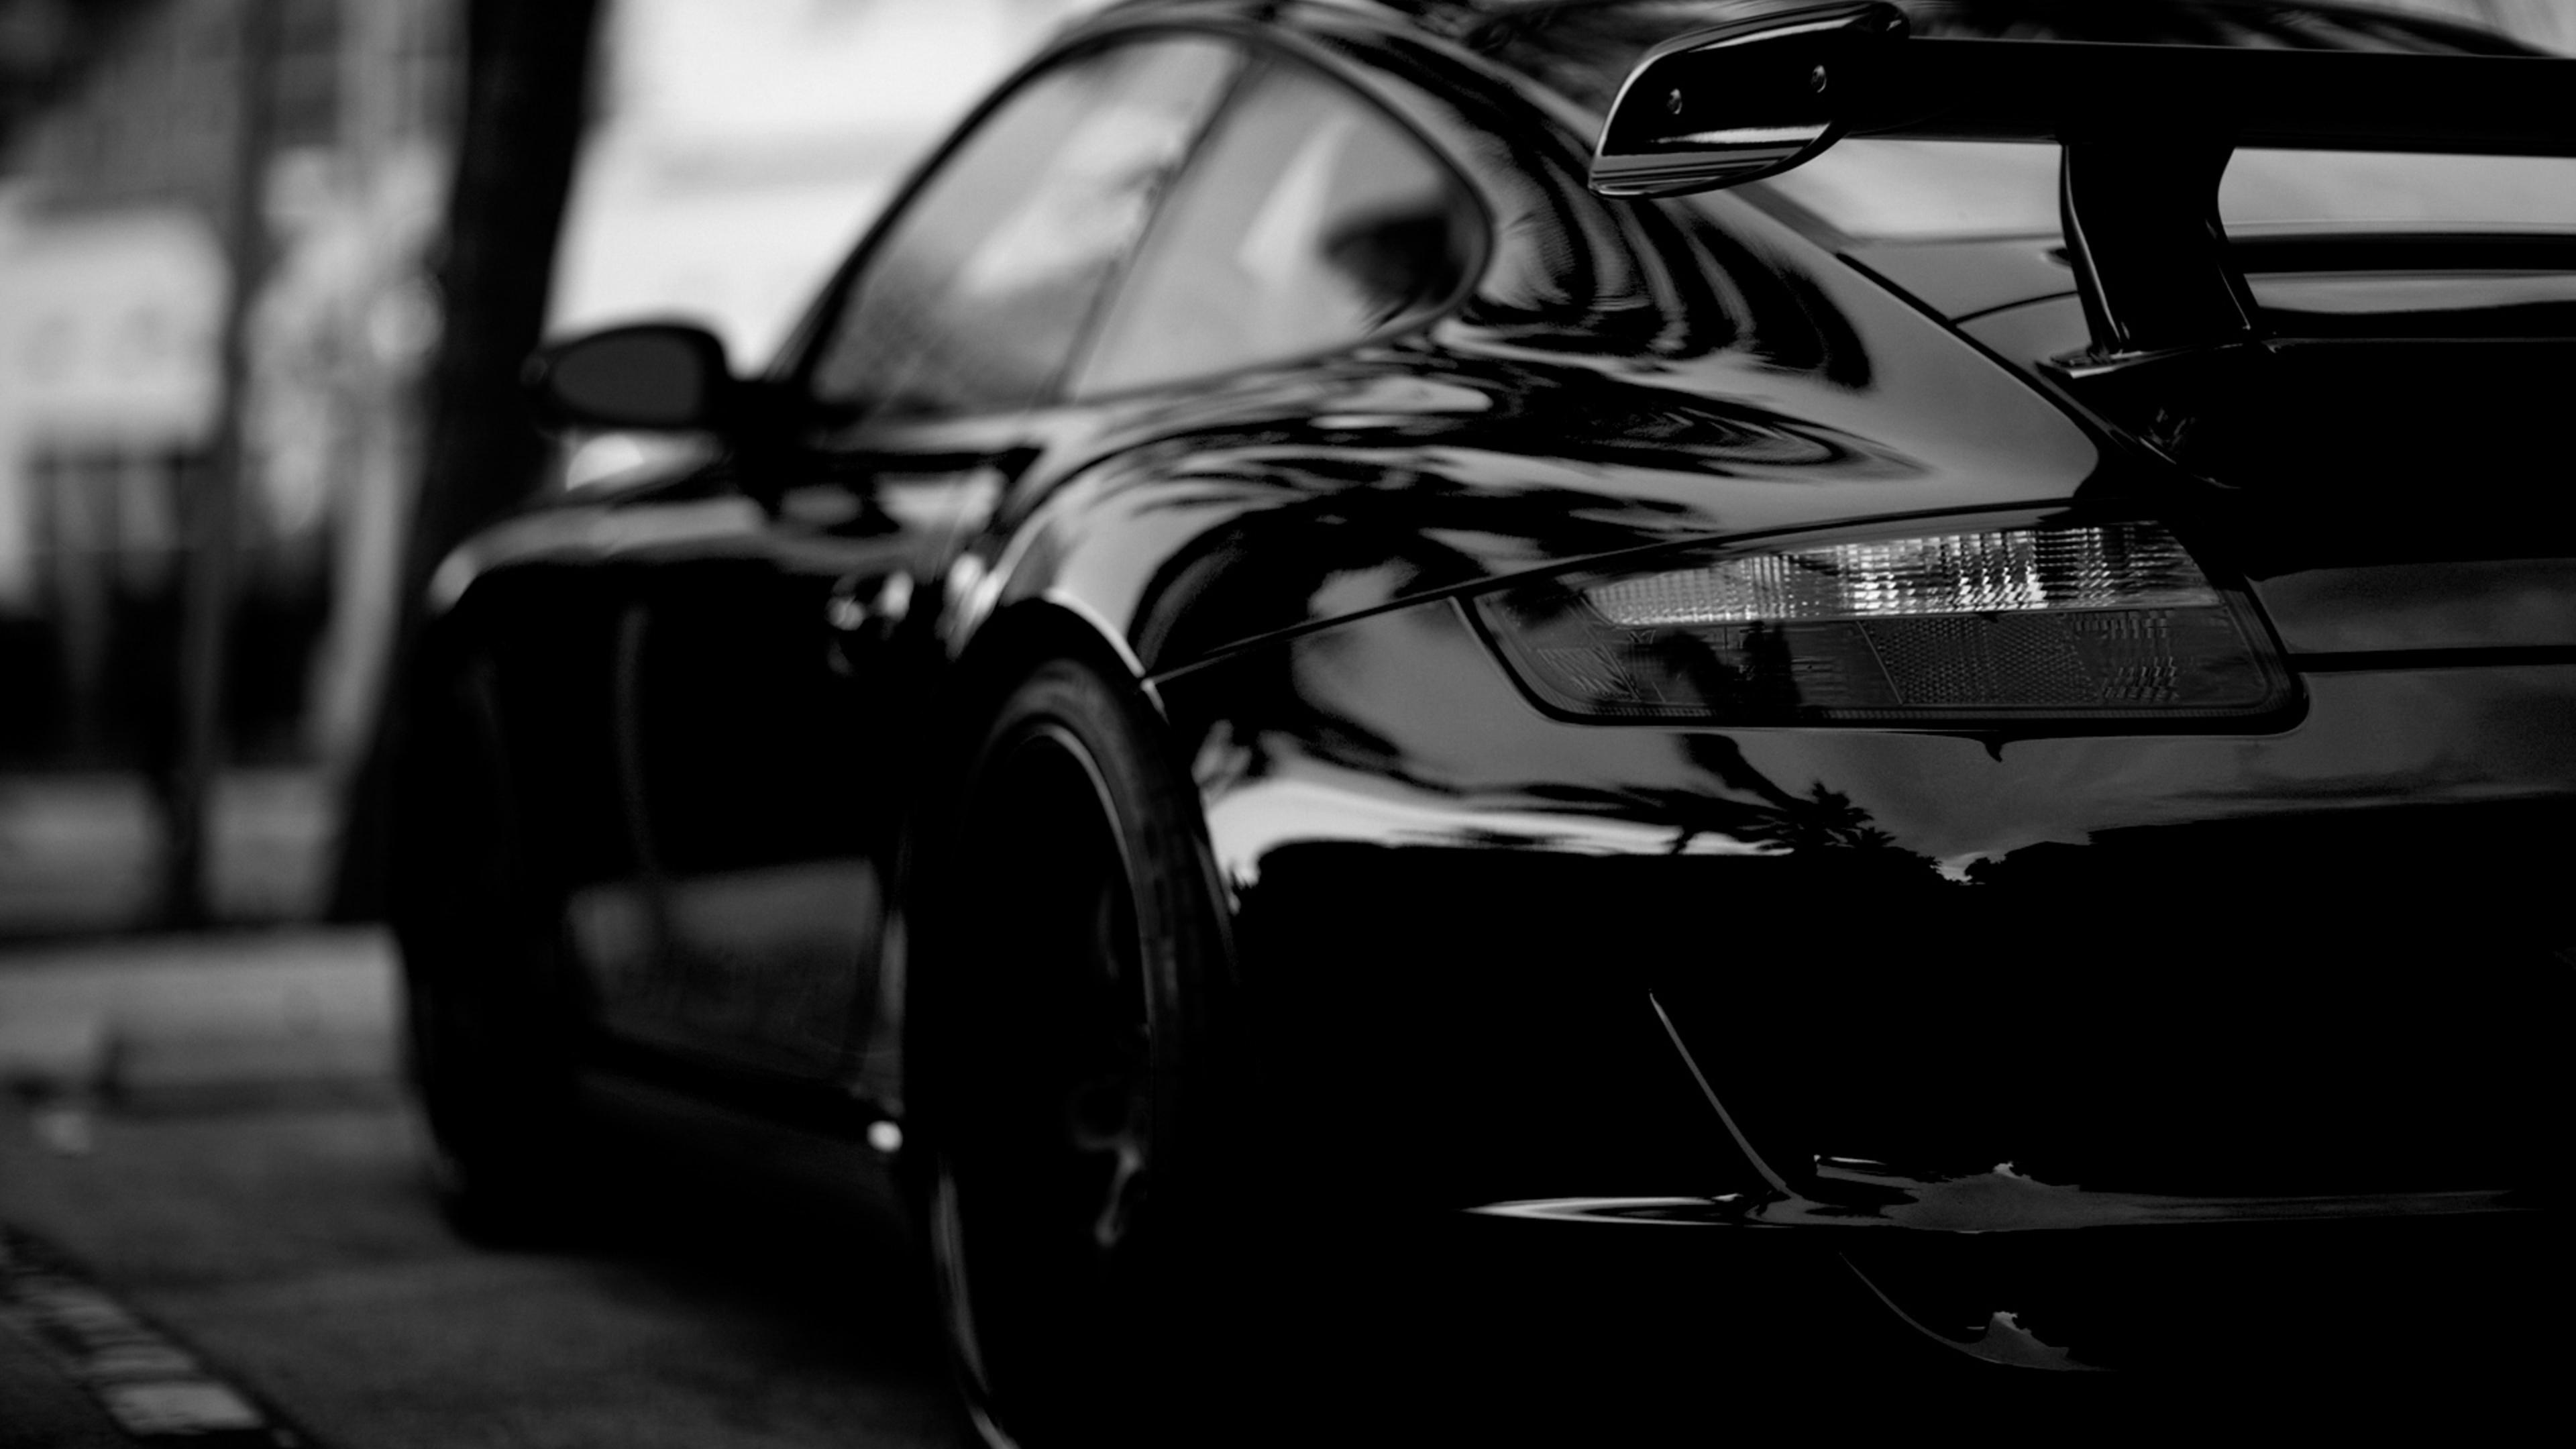 13 4k Resolution Car Wallpaper 4k Black Background Picture Idokeren